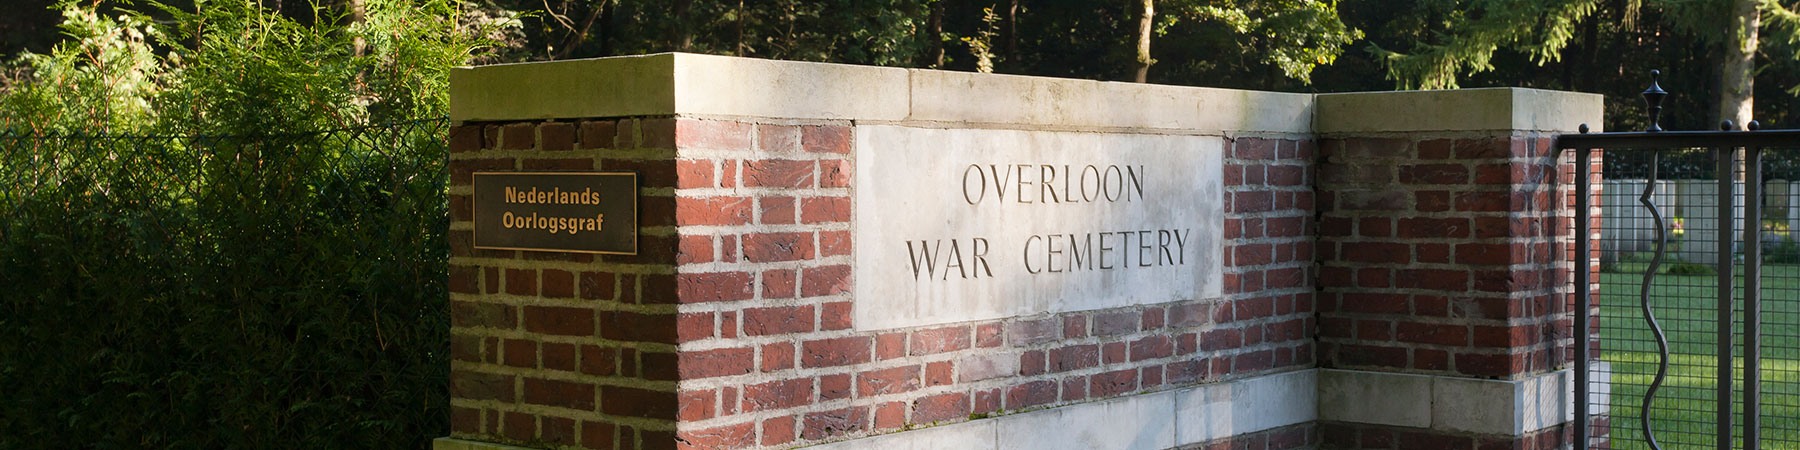 war-cemetery-overloon1